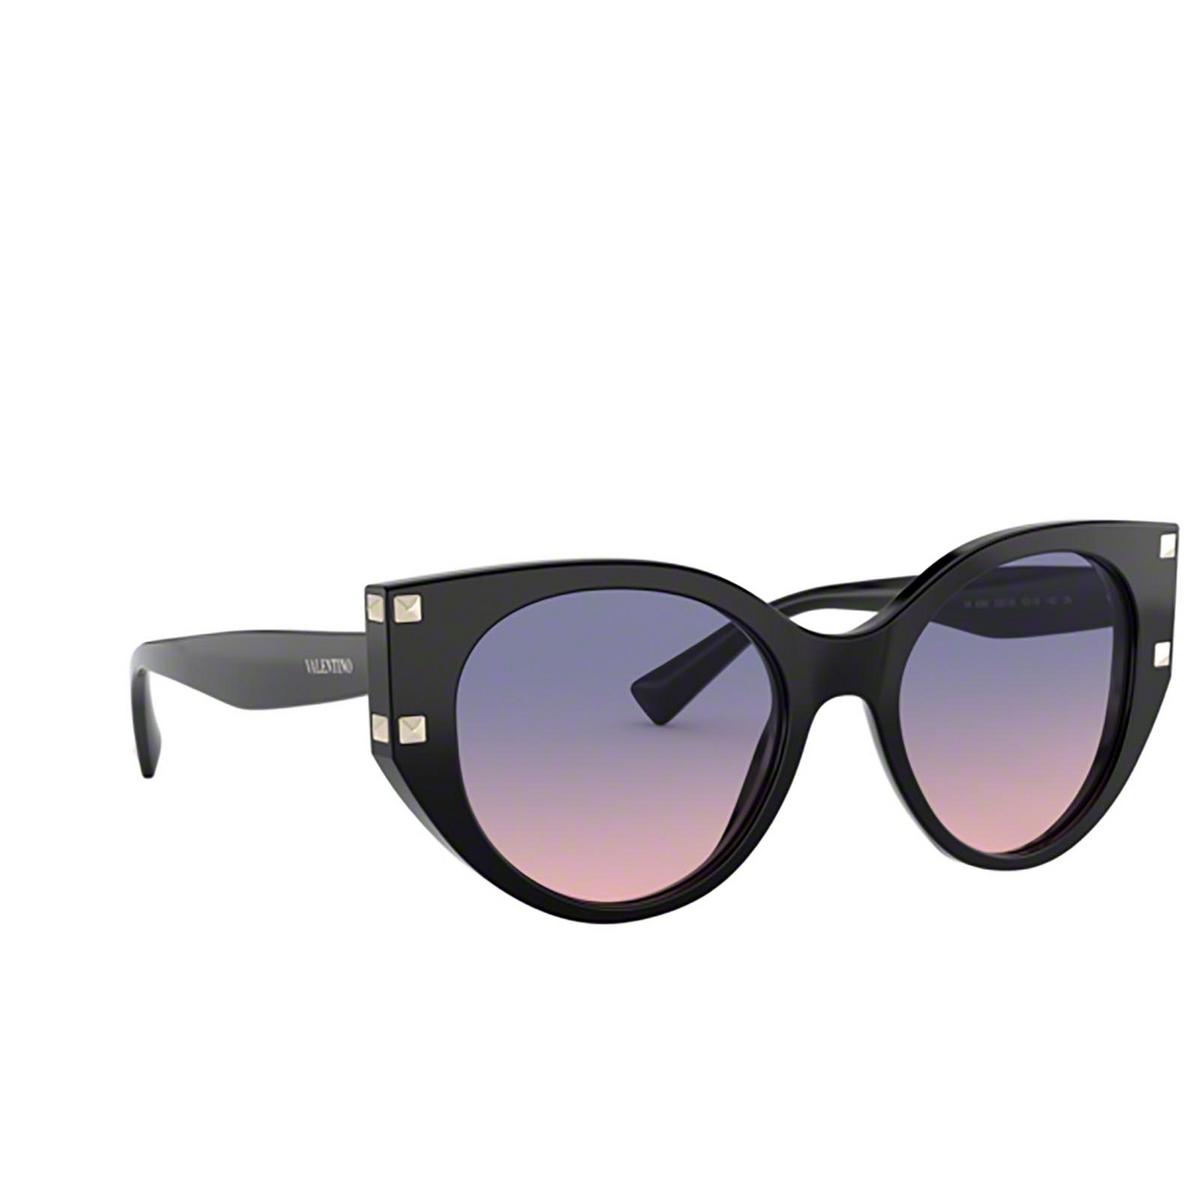 Valentino® Cat-eye Sunglasses: VA4068 color Black 5001I6.